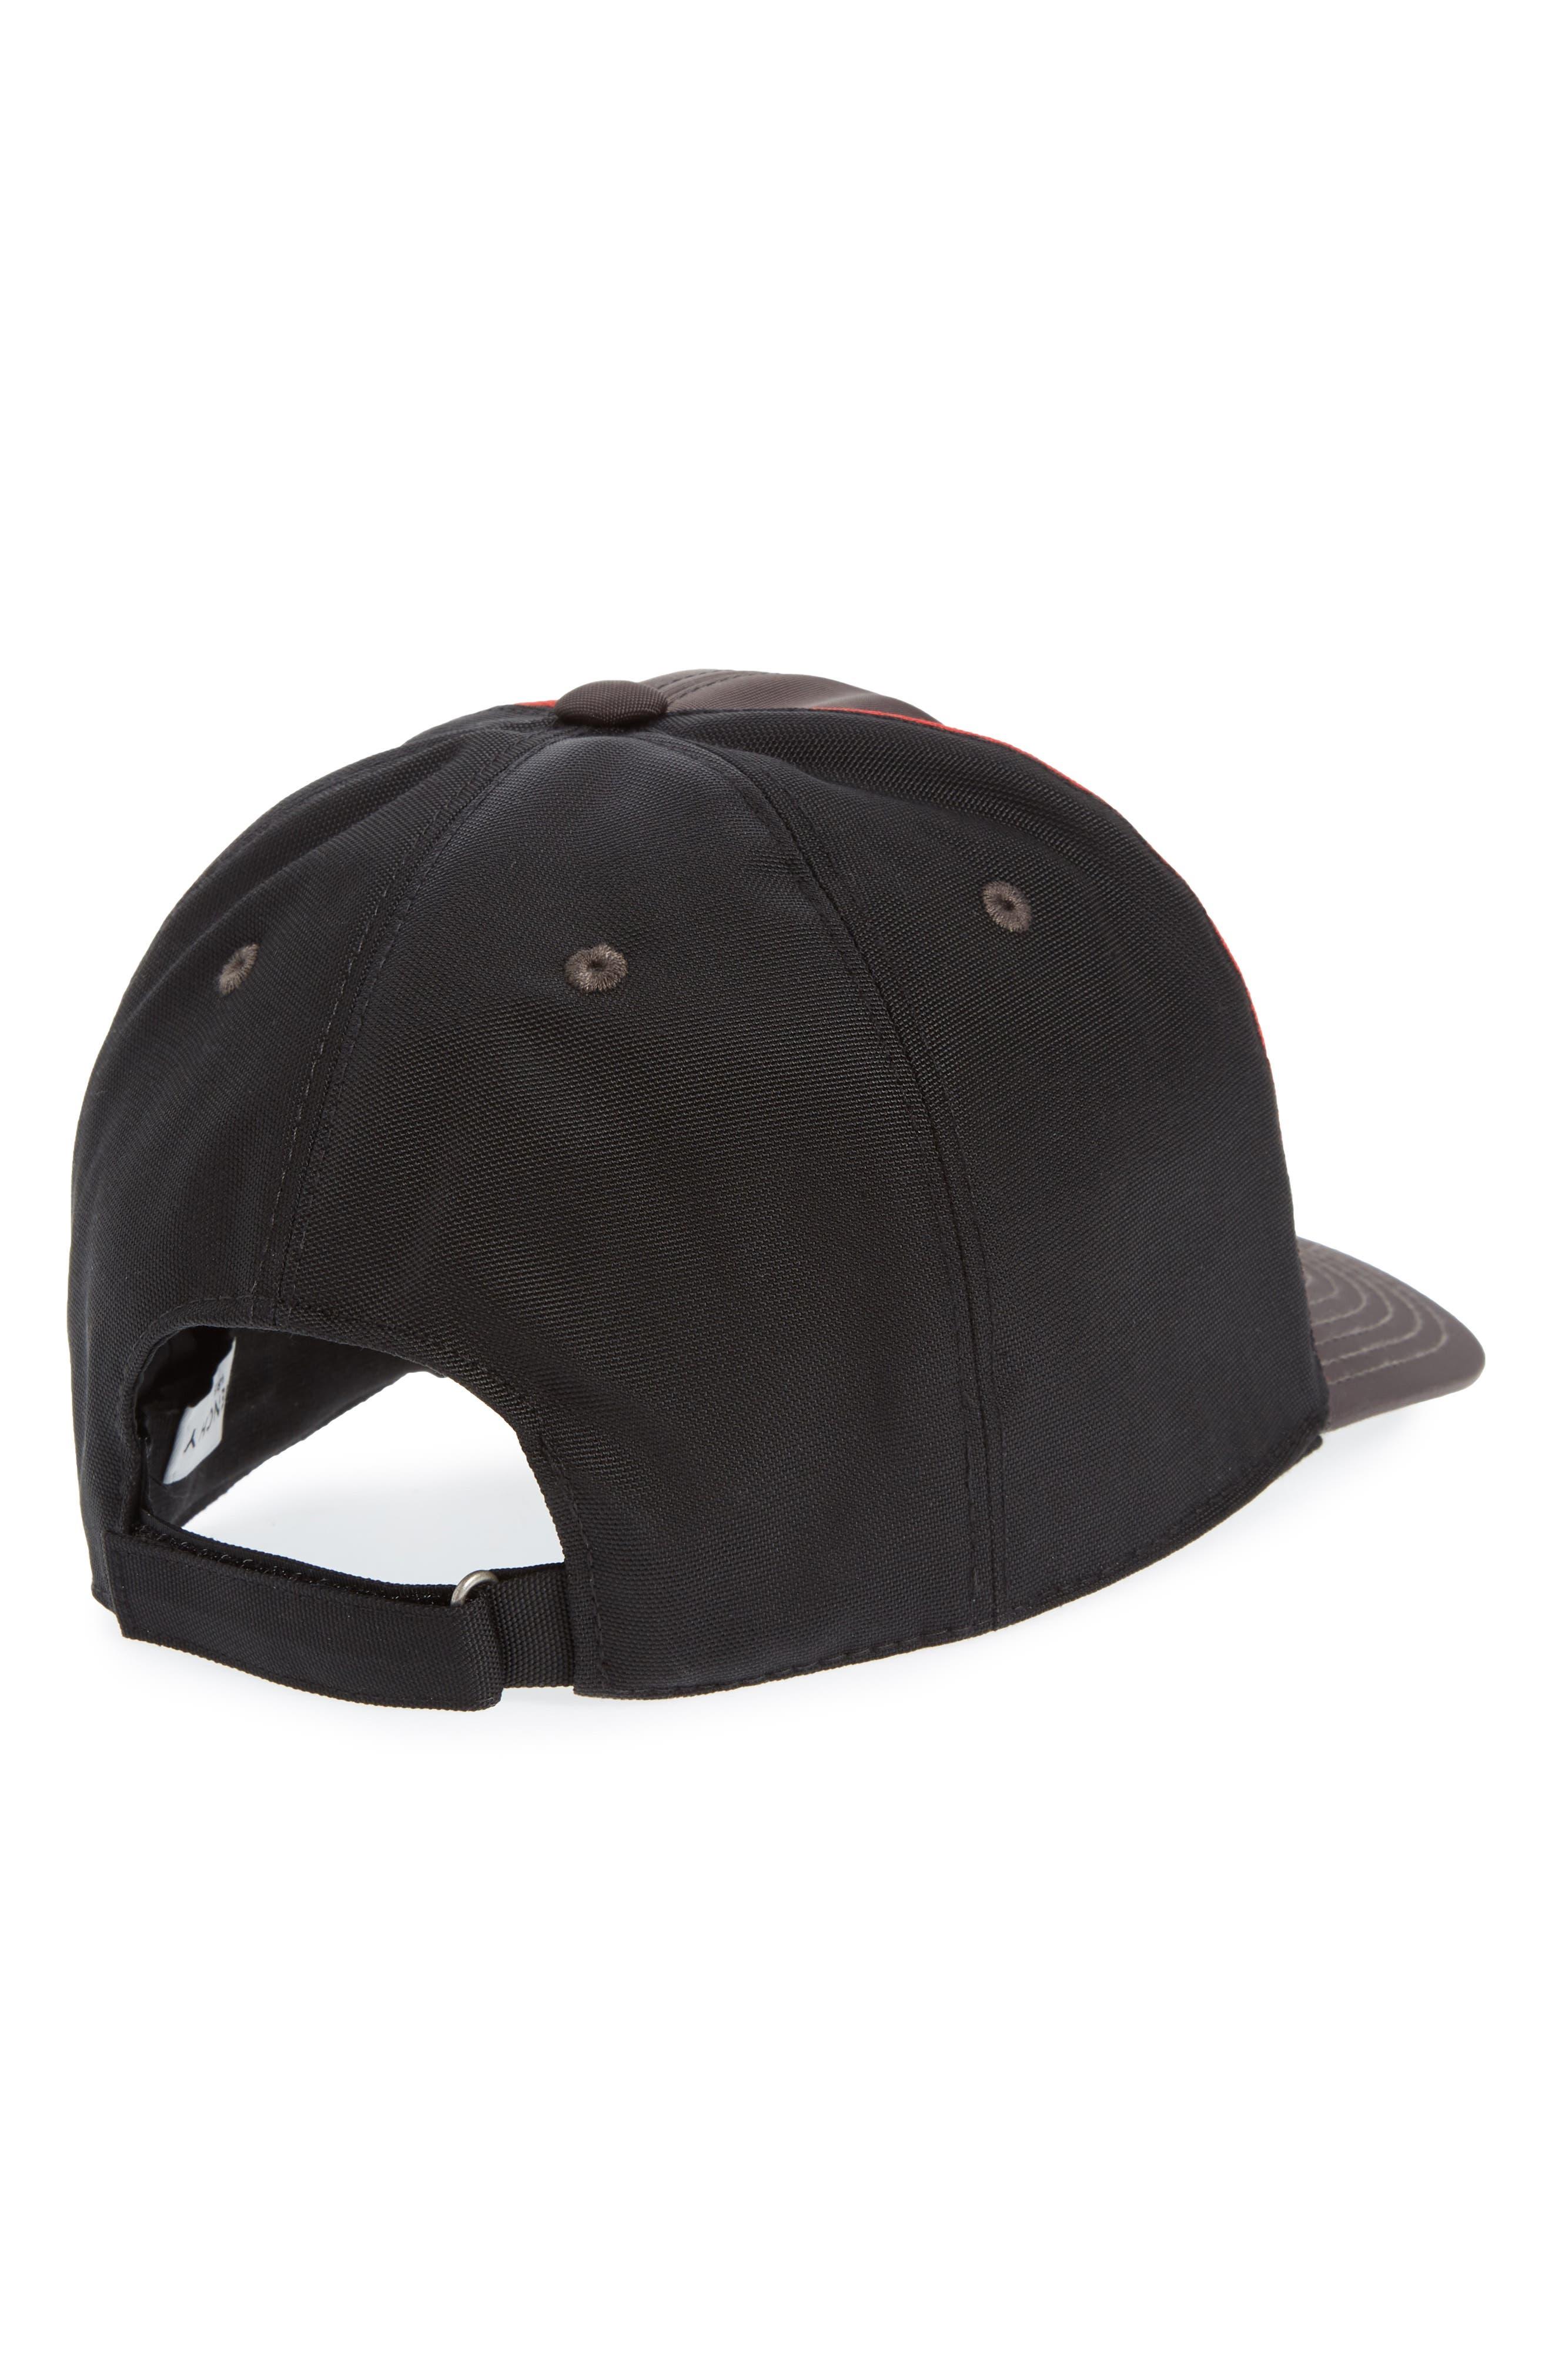 Two-Tone Ball Cap,                             Alternate thumbnail 2, color,                             Black/ Grey